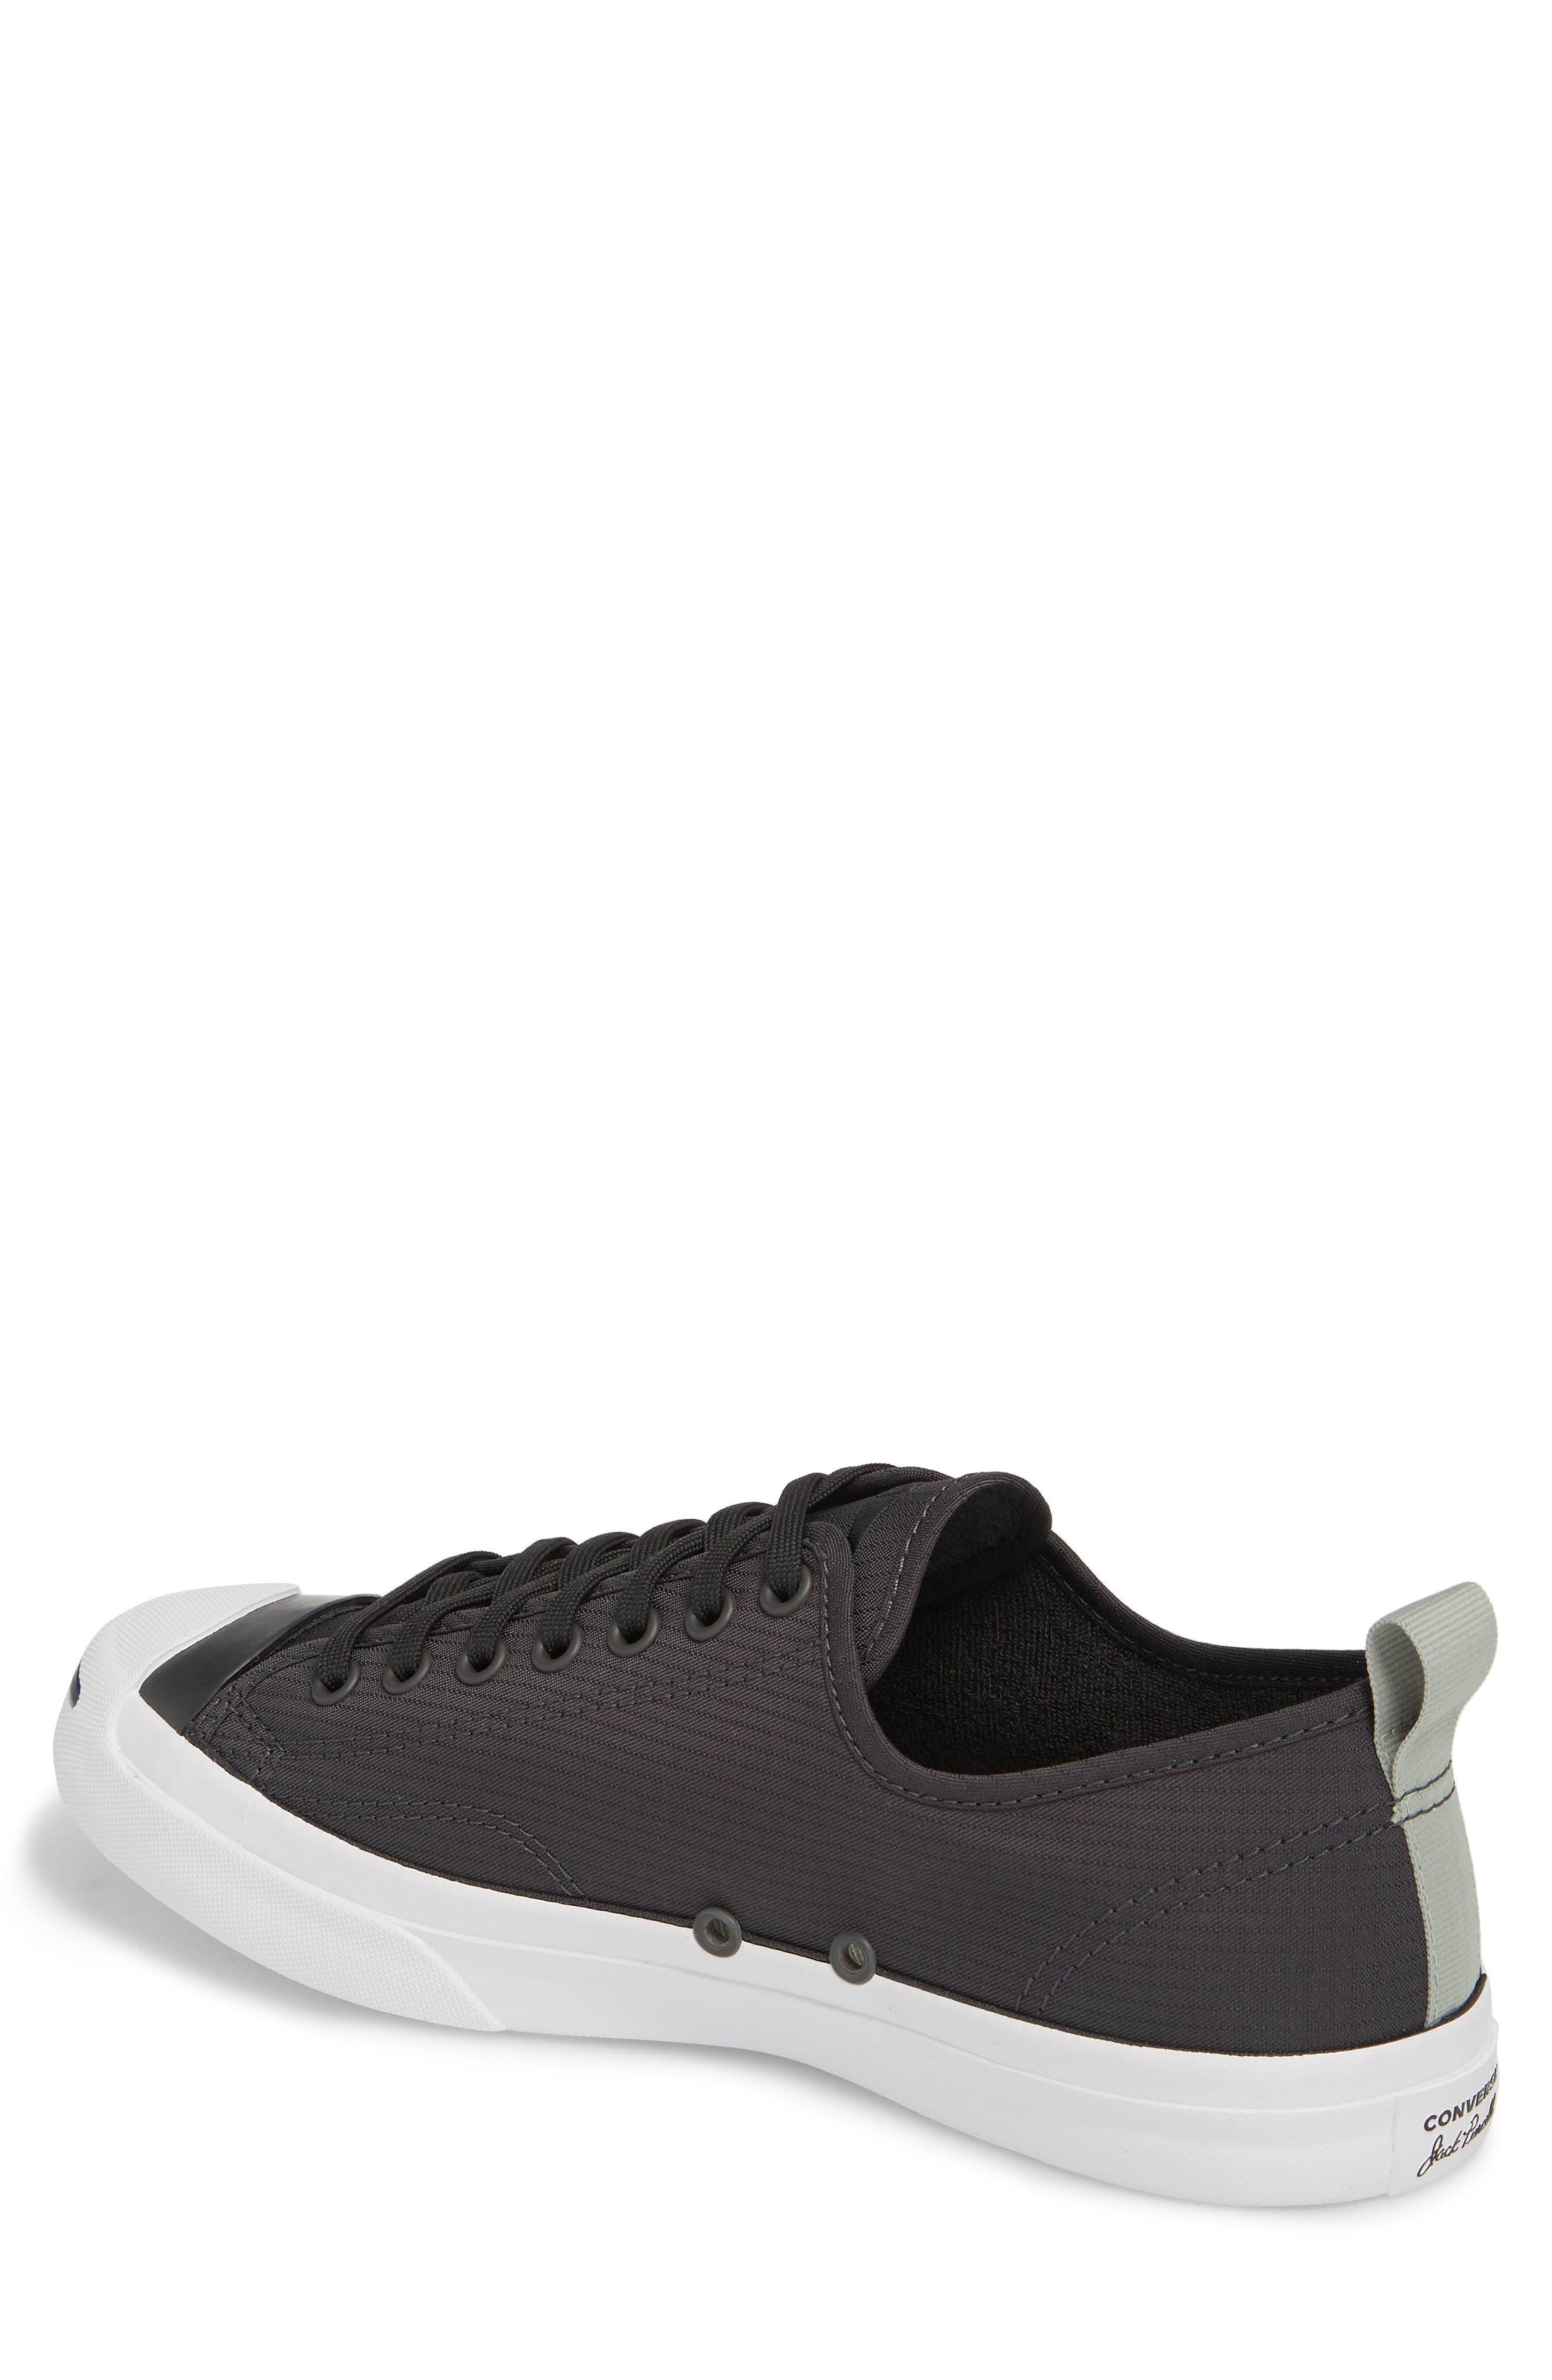 Jack Purcell Ripstop Sneaker,                             Alternate thumbnail 2, color,                             Black